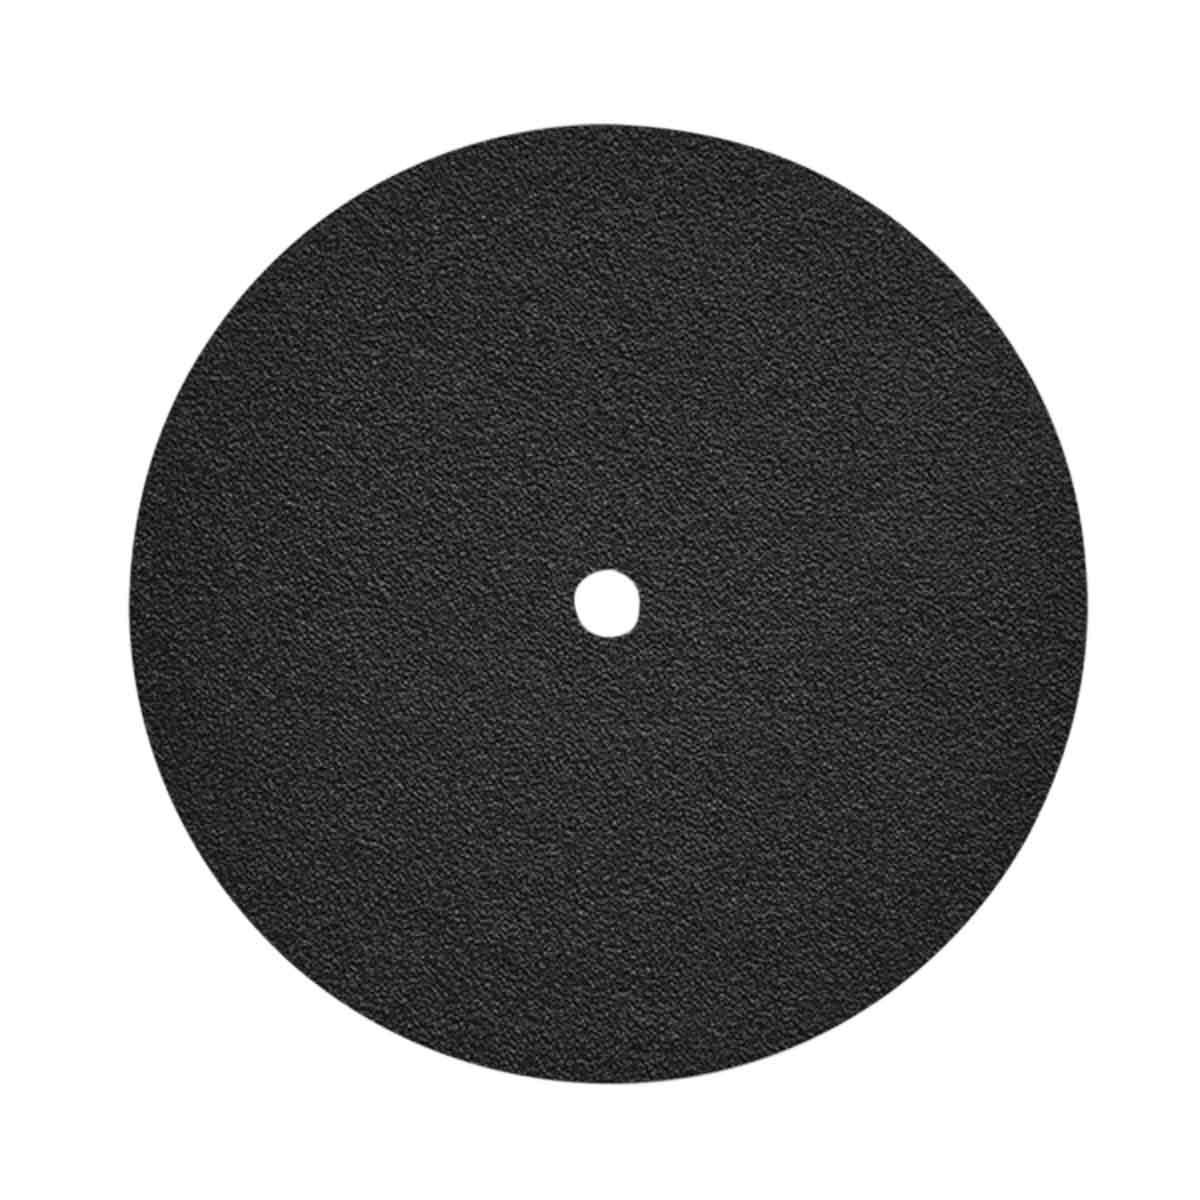 Dremel Accesorio Disco De Lija Grano 220 36 Pzs 2615000412